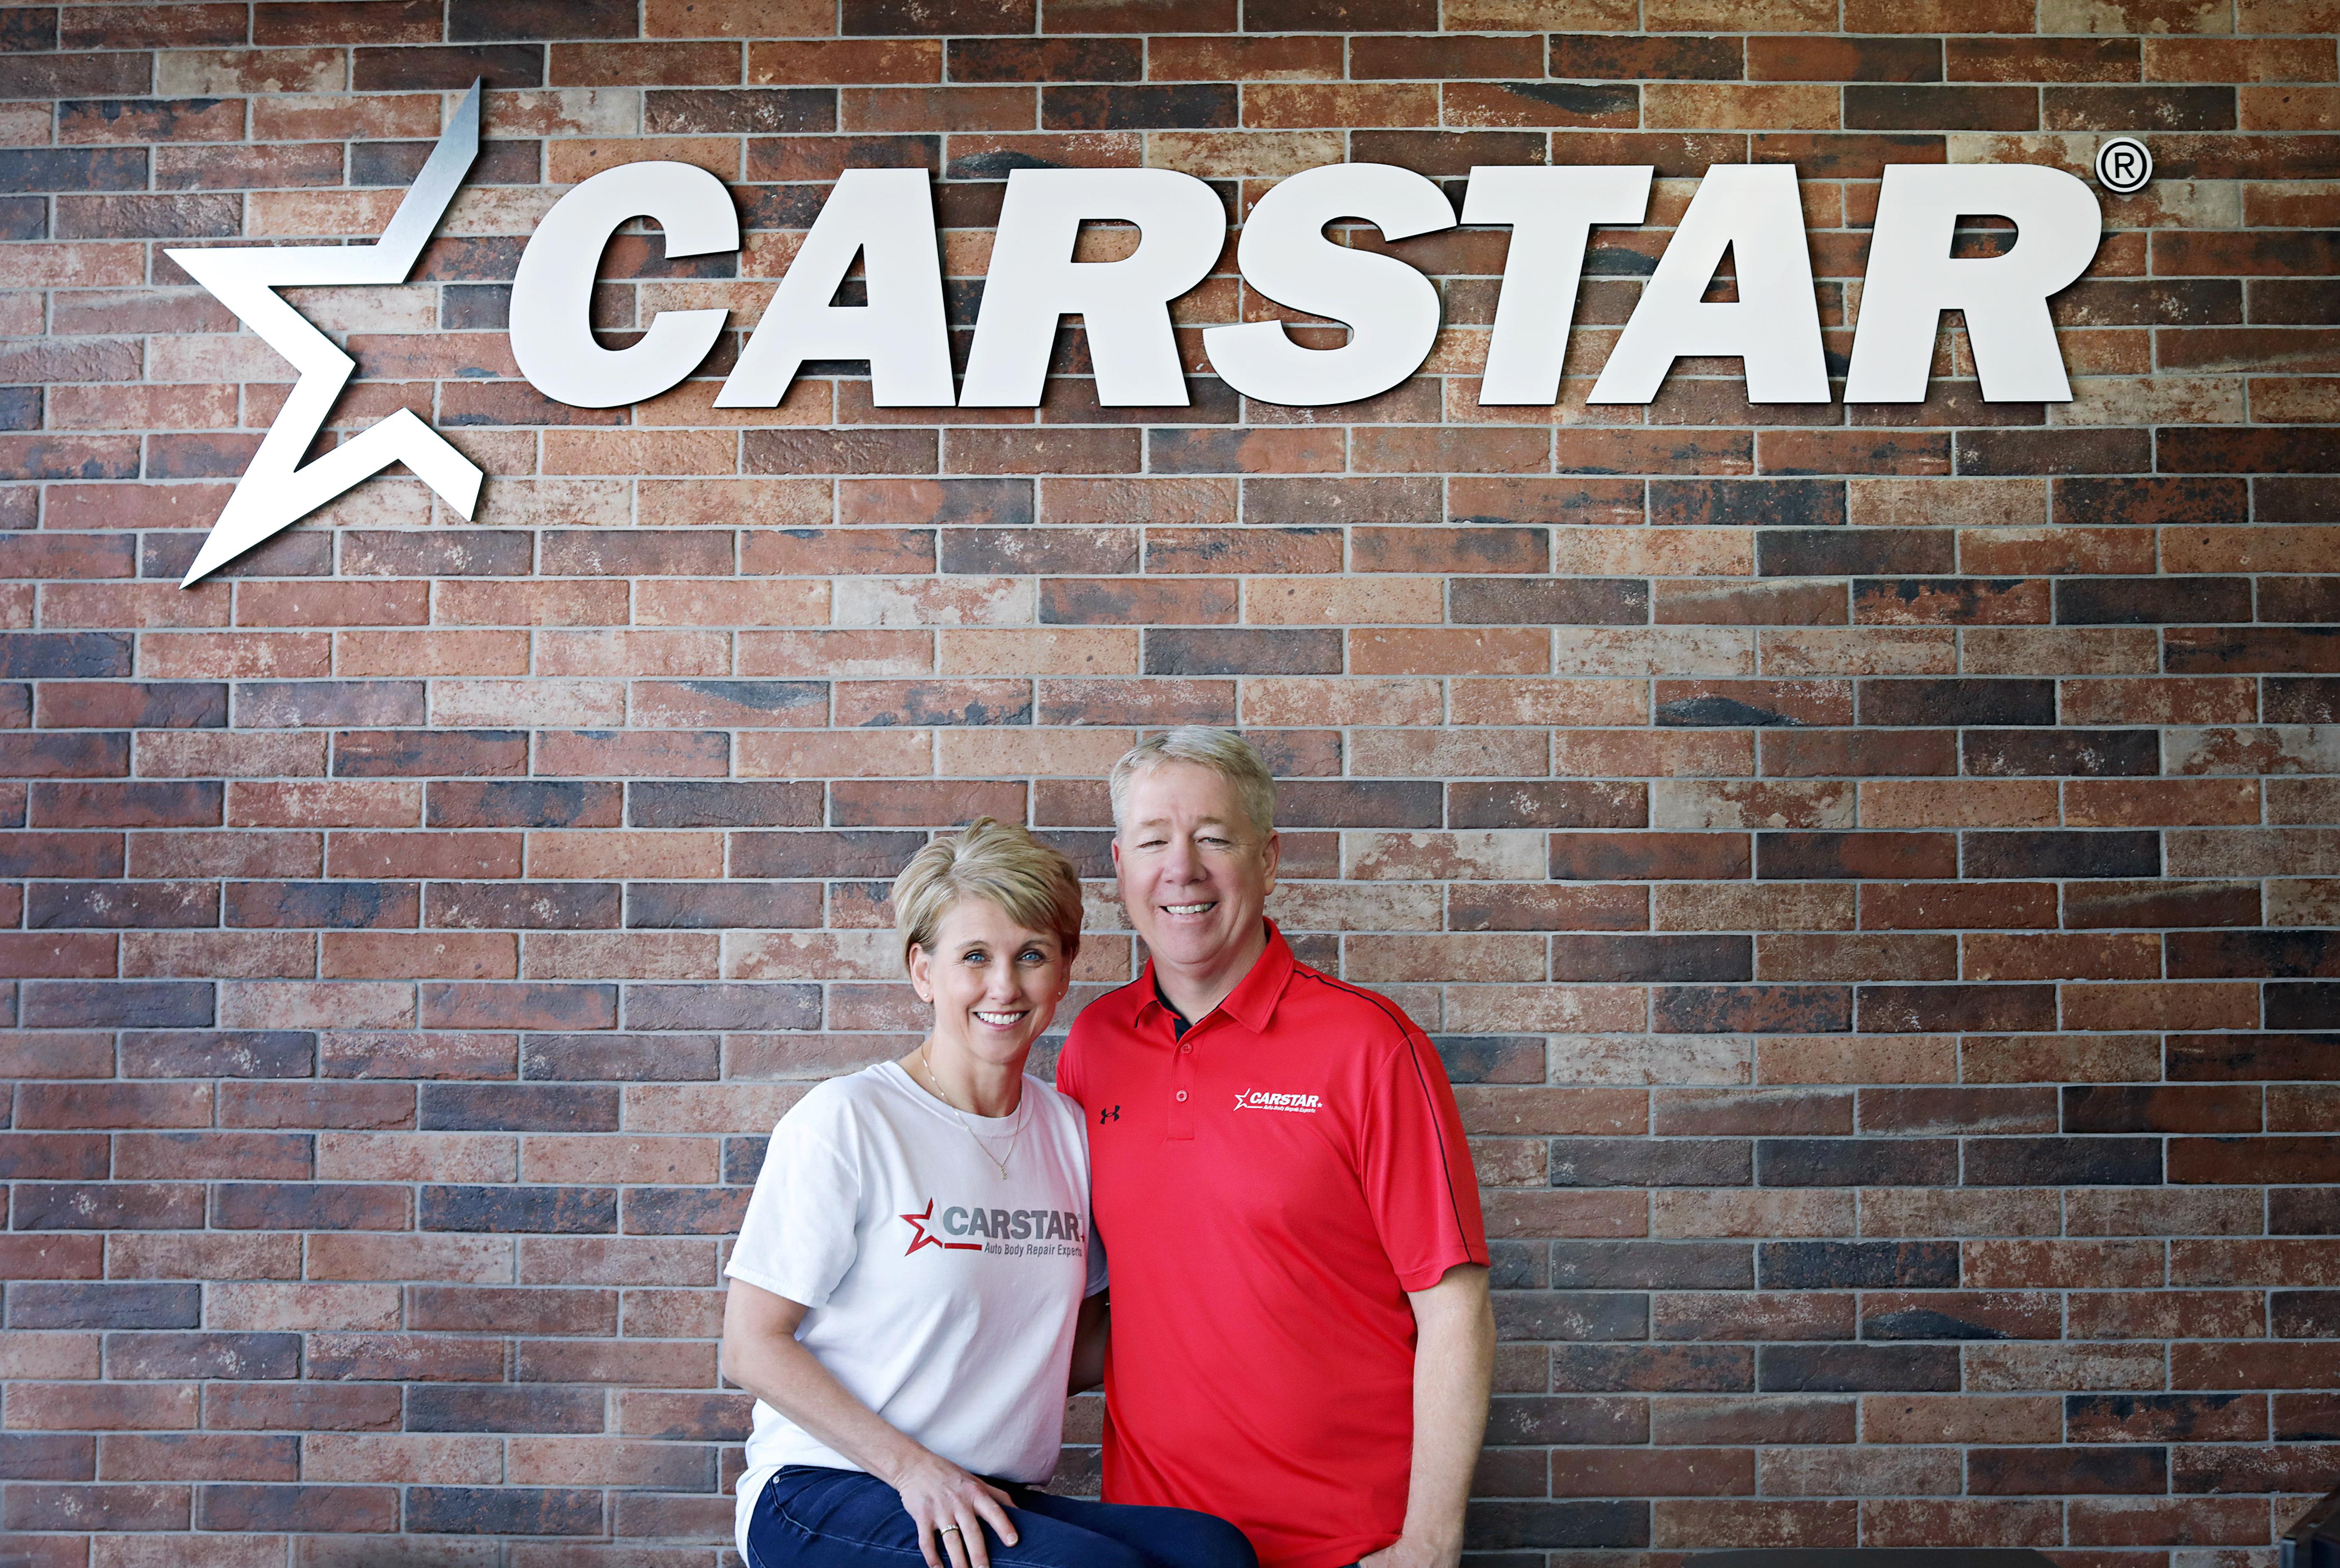 Carstar | Kurt and Kathy Johnson Owners